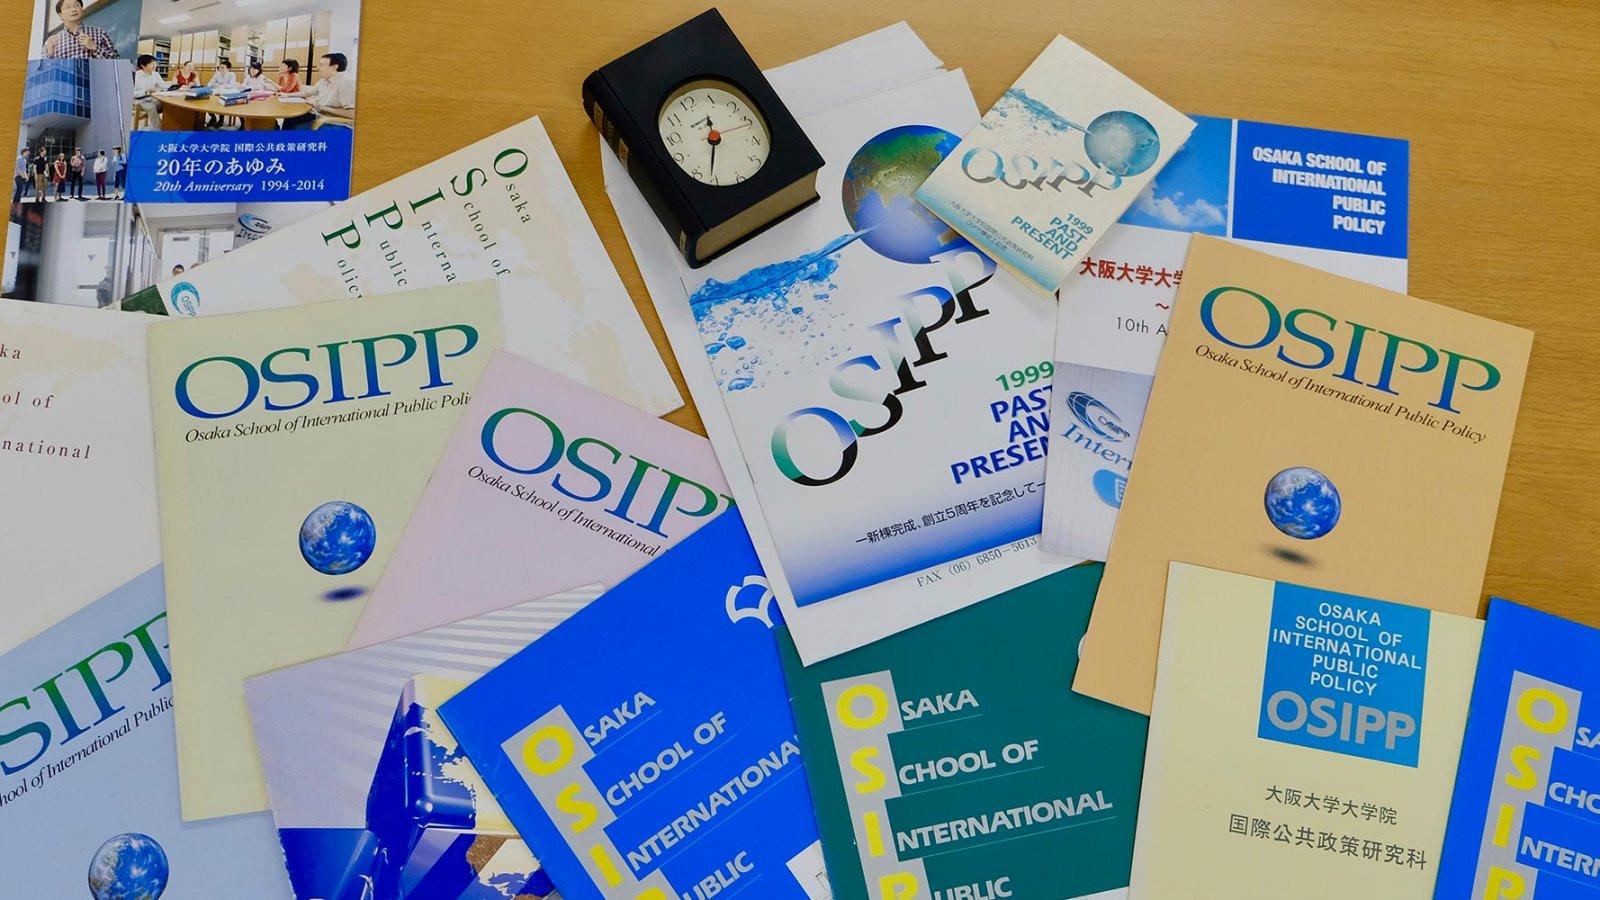 OSIPP-History